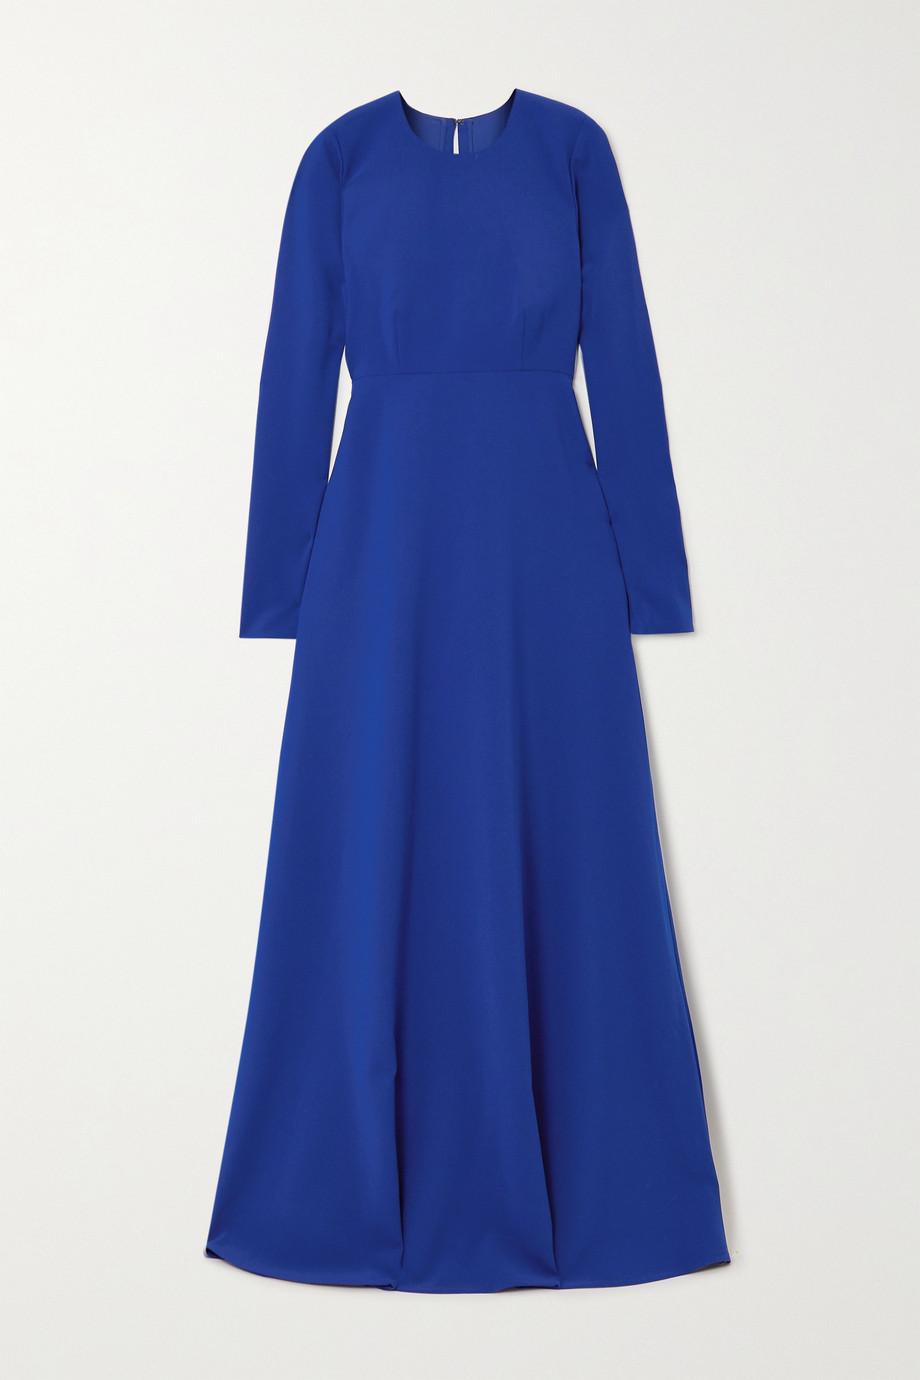 Carolina Herrera Open-back stretch-crepe gown